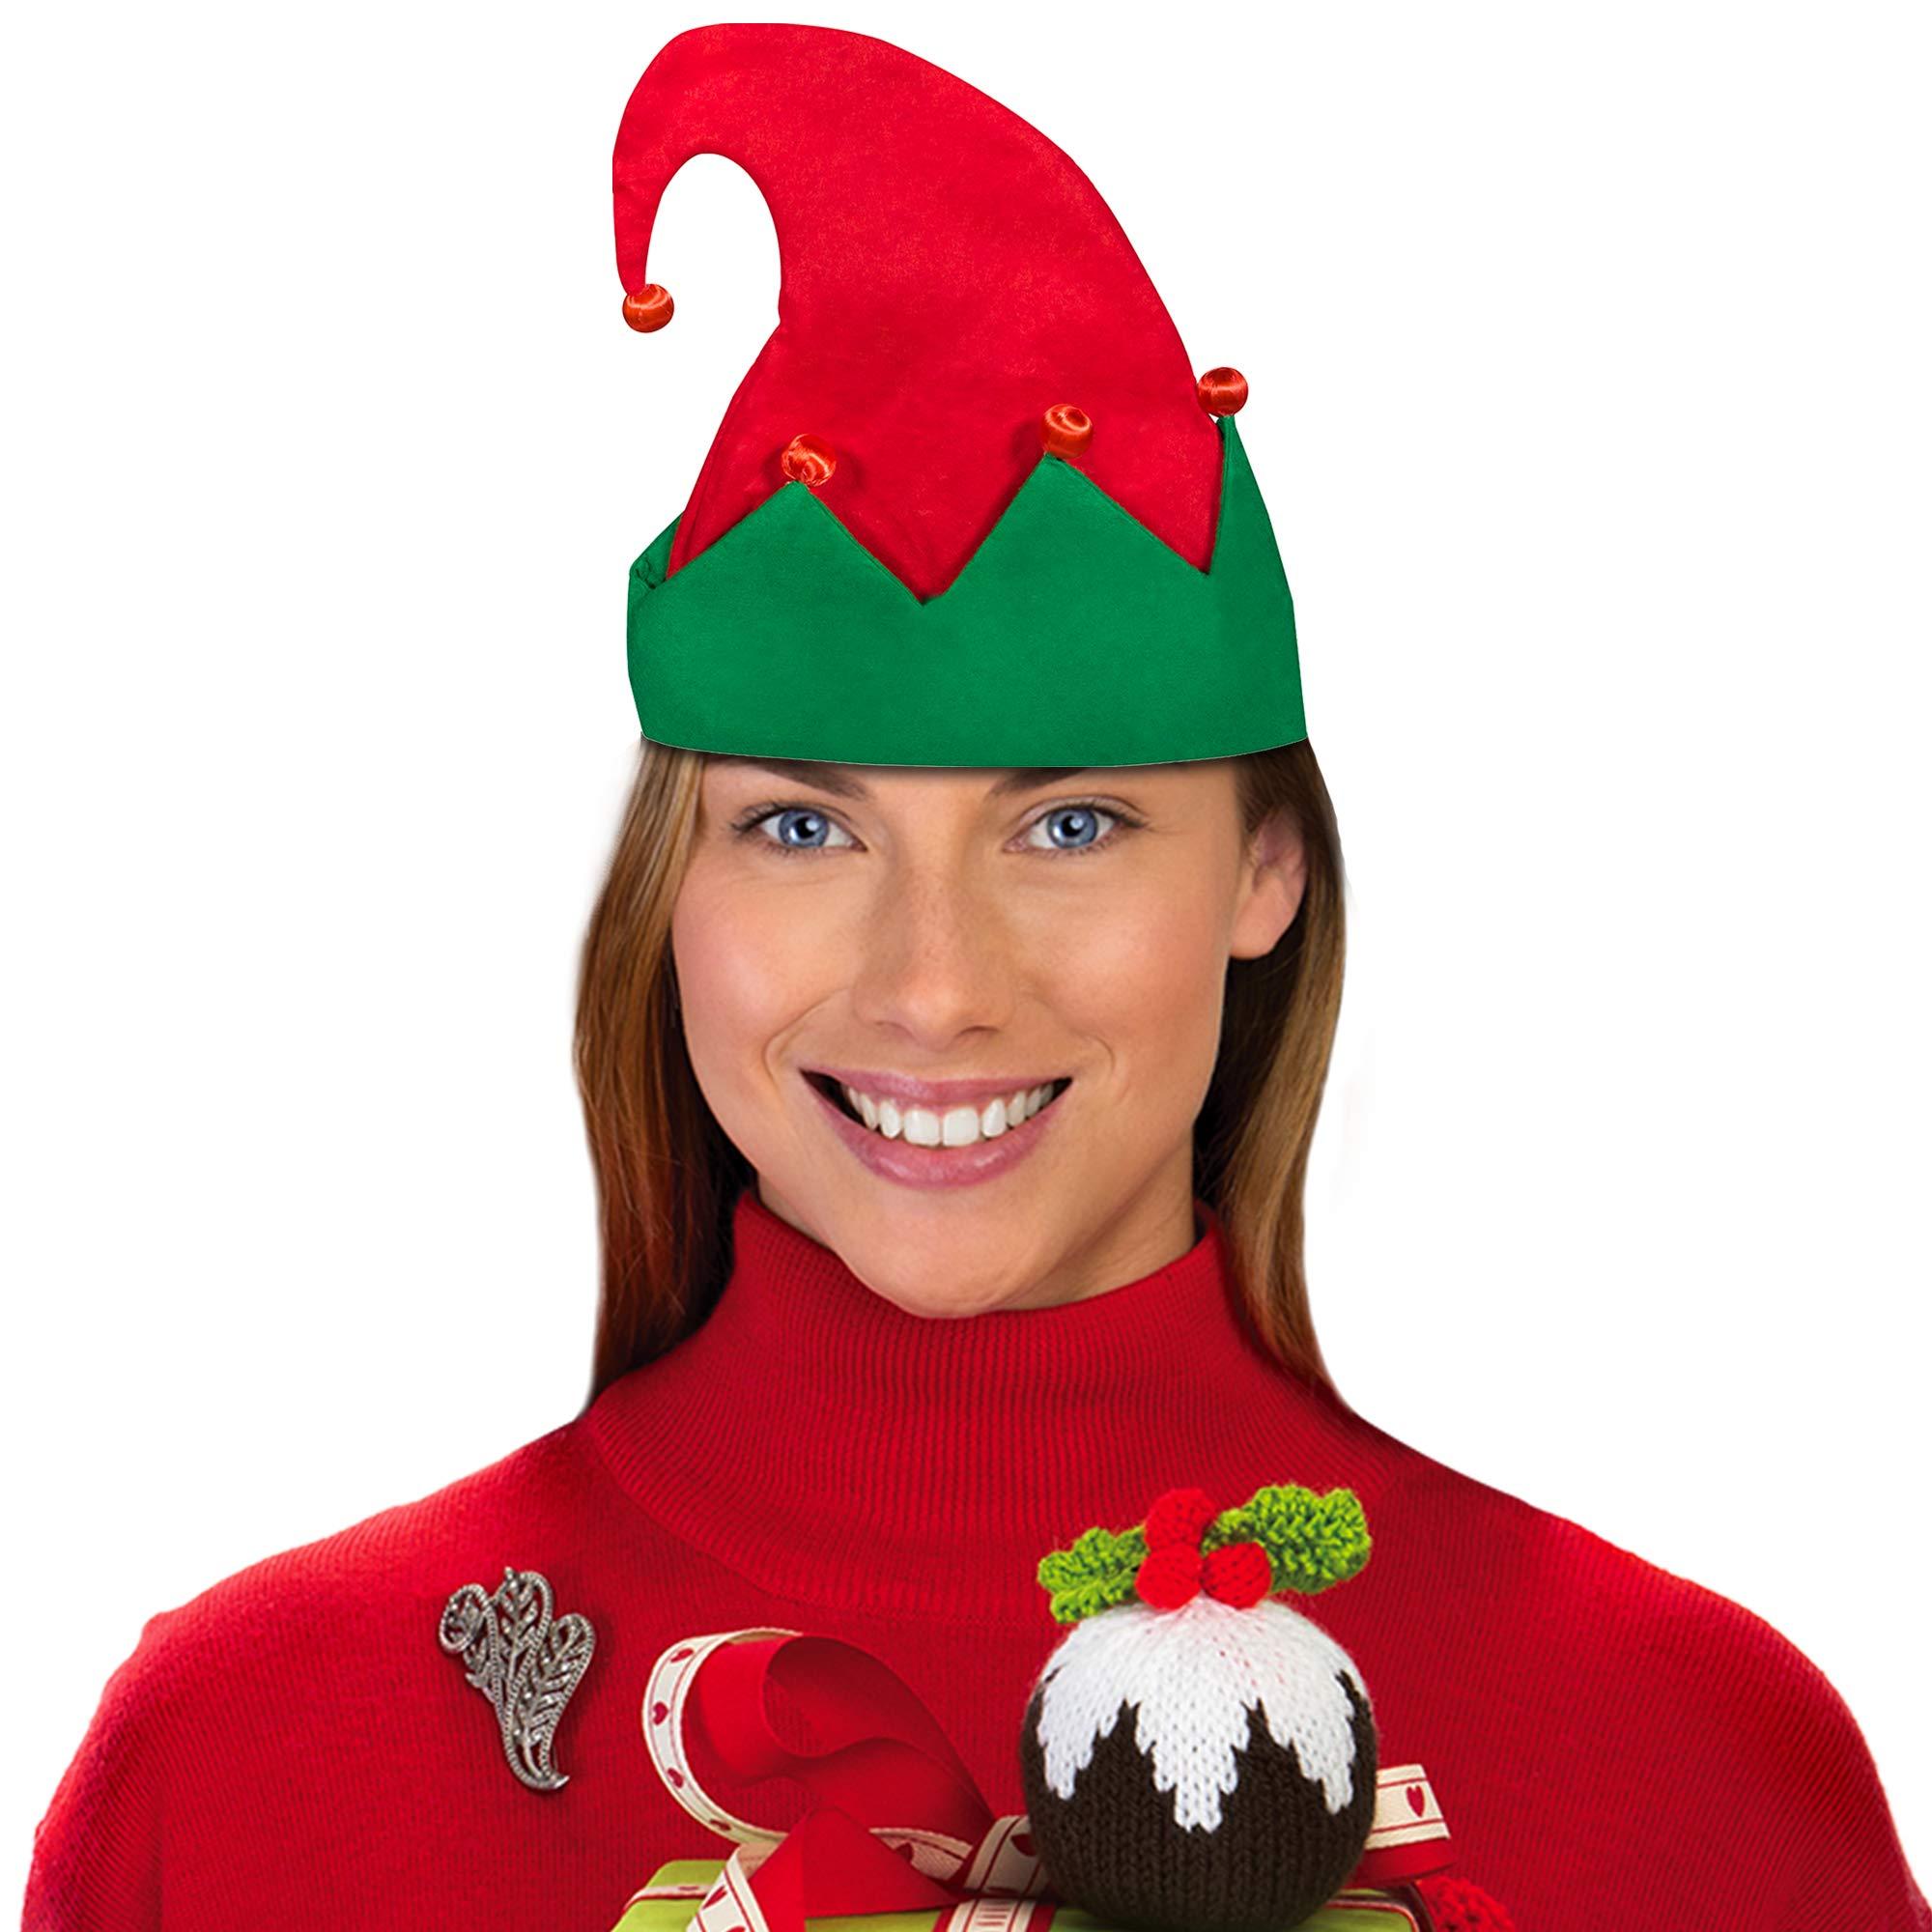 LED Light Up Festive Christmas Santa Elf Hat - Family 12 Pack by Windy City Novelties (Image #7)